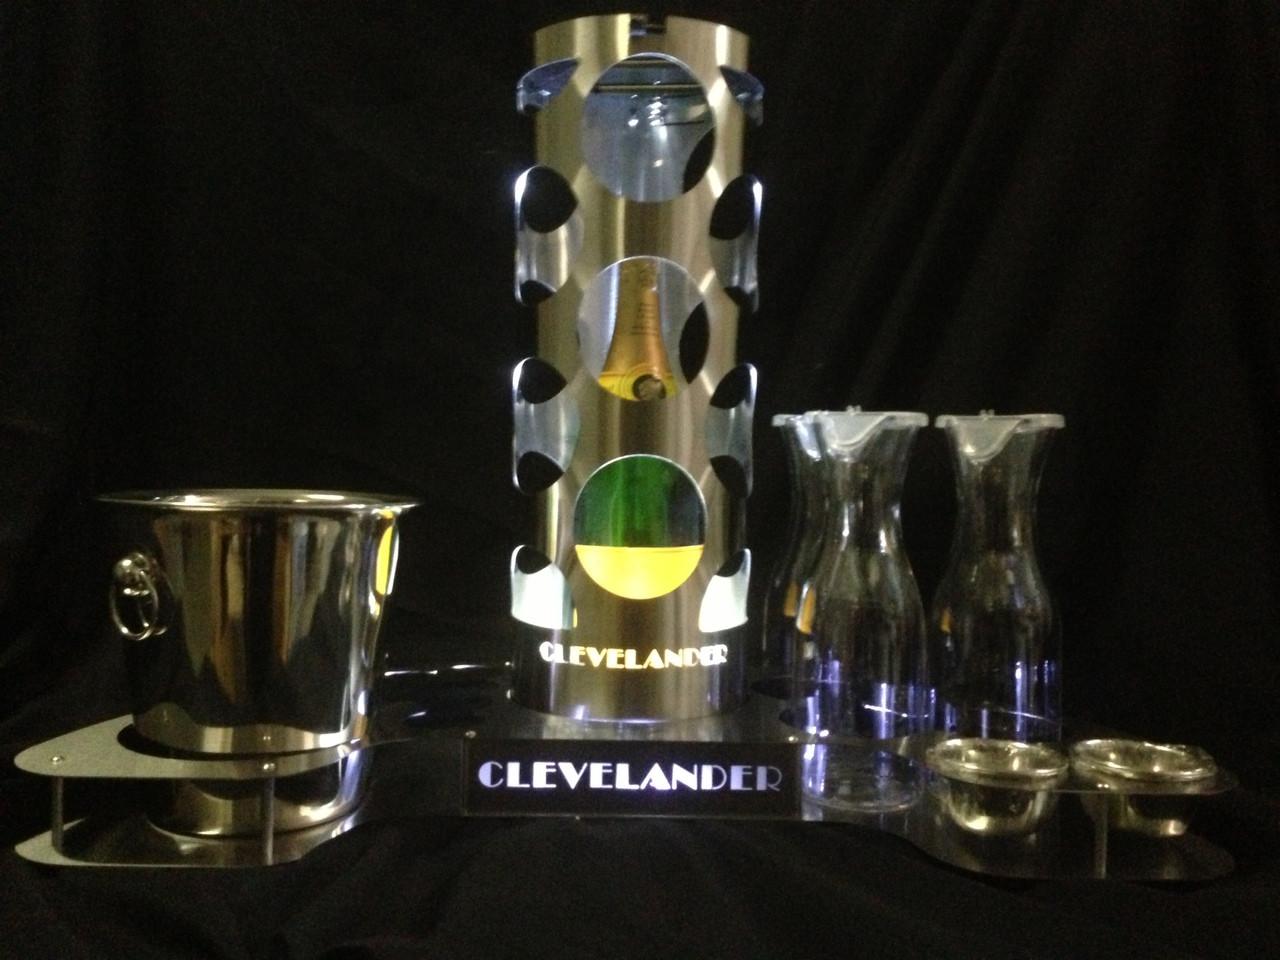 Bottle service tray, VIP Bottle Tray, Bottle, VIP, Tray, LED, Cage, Ice Bucket